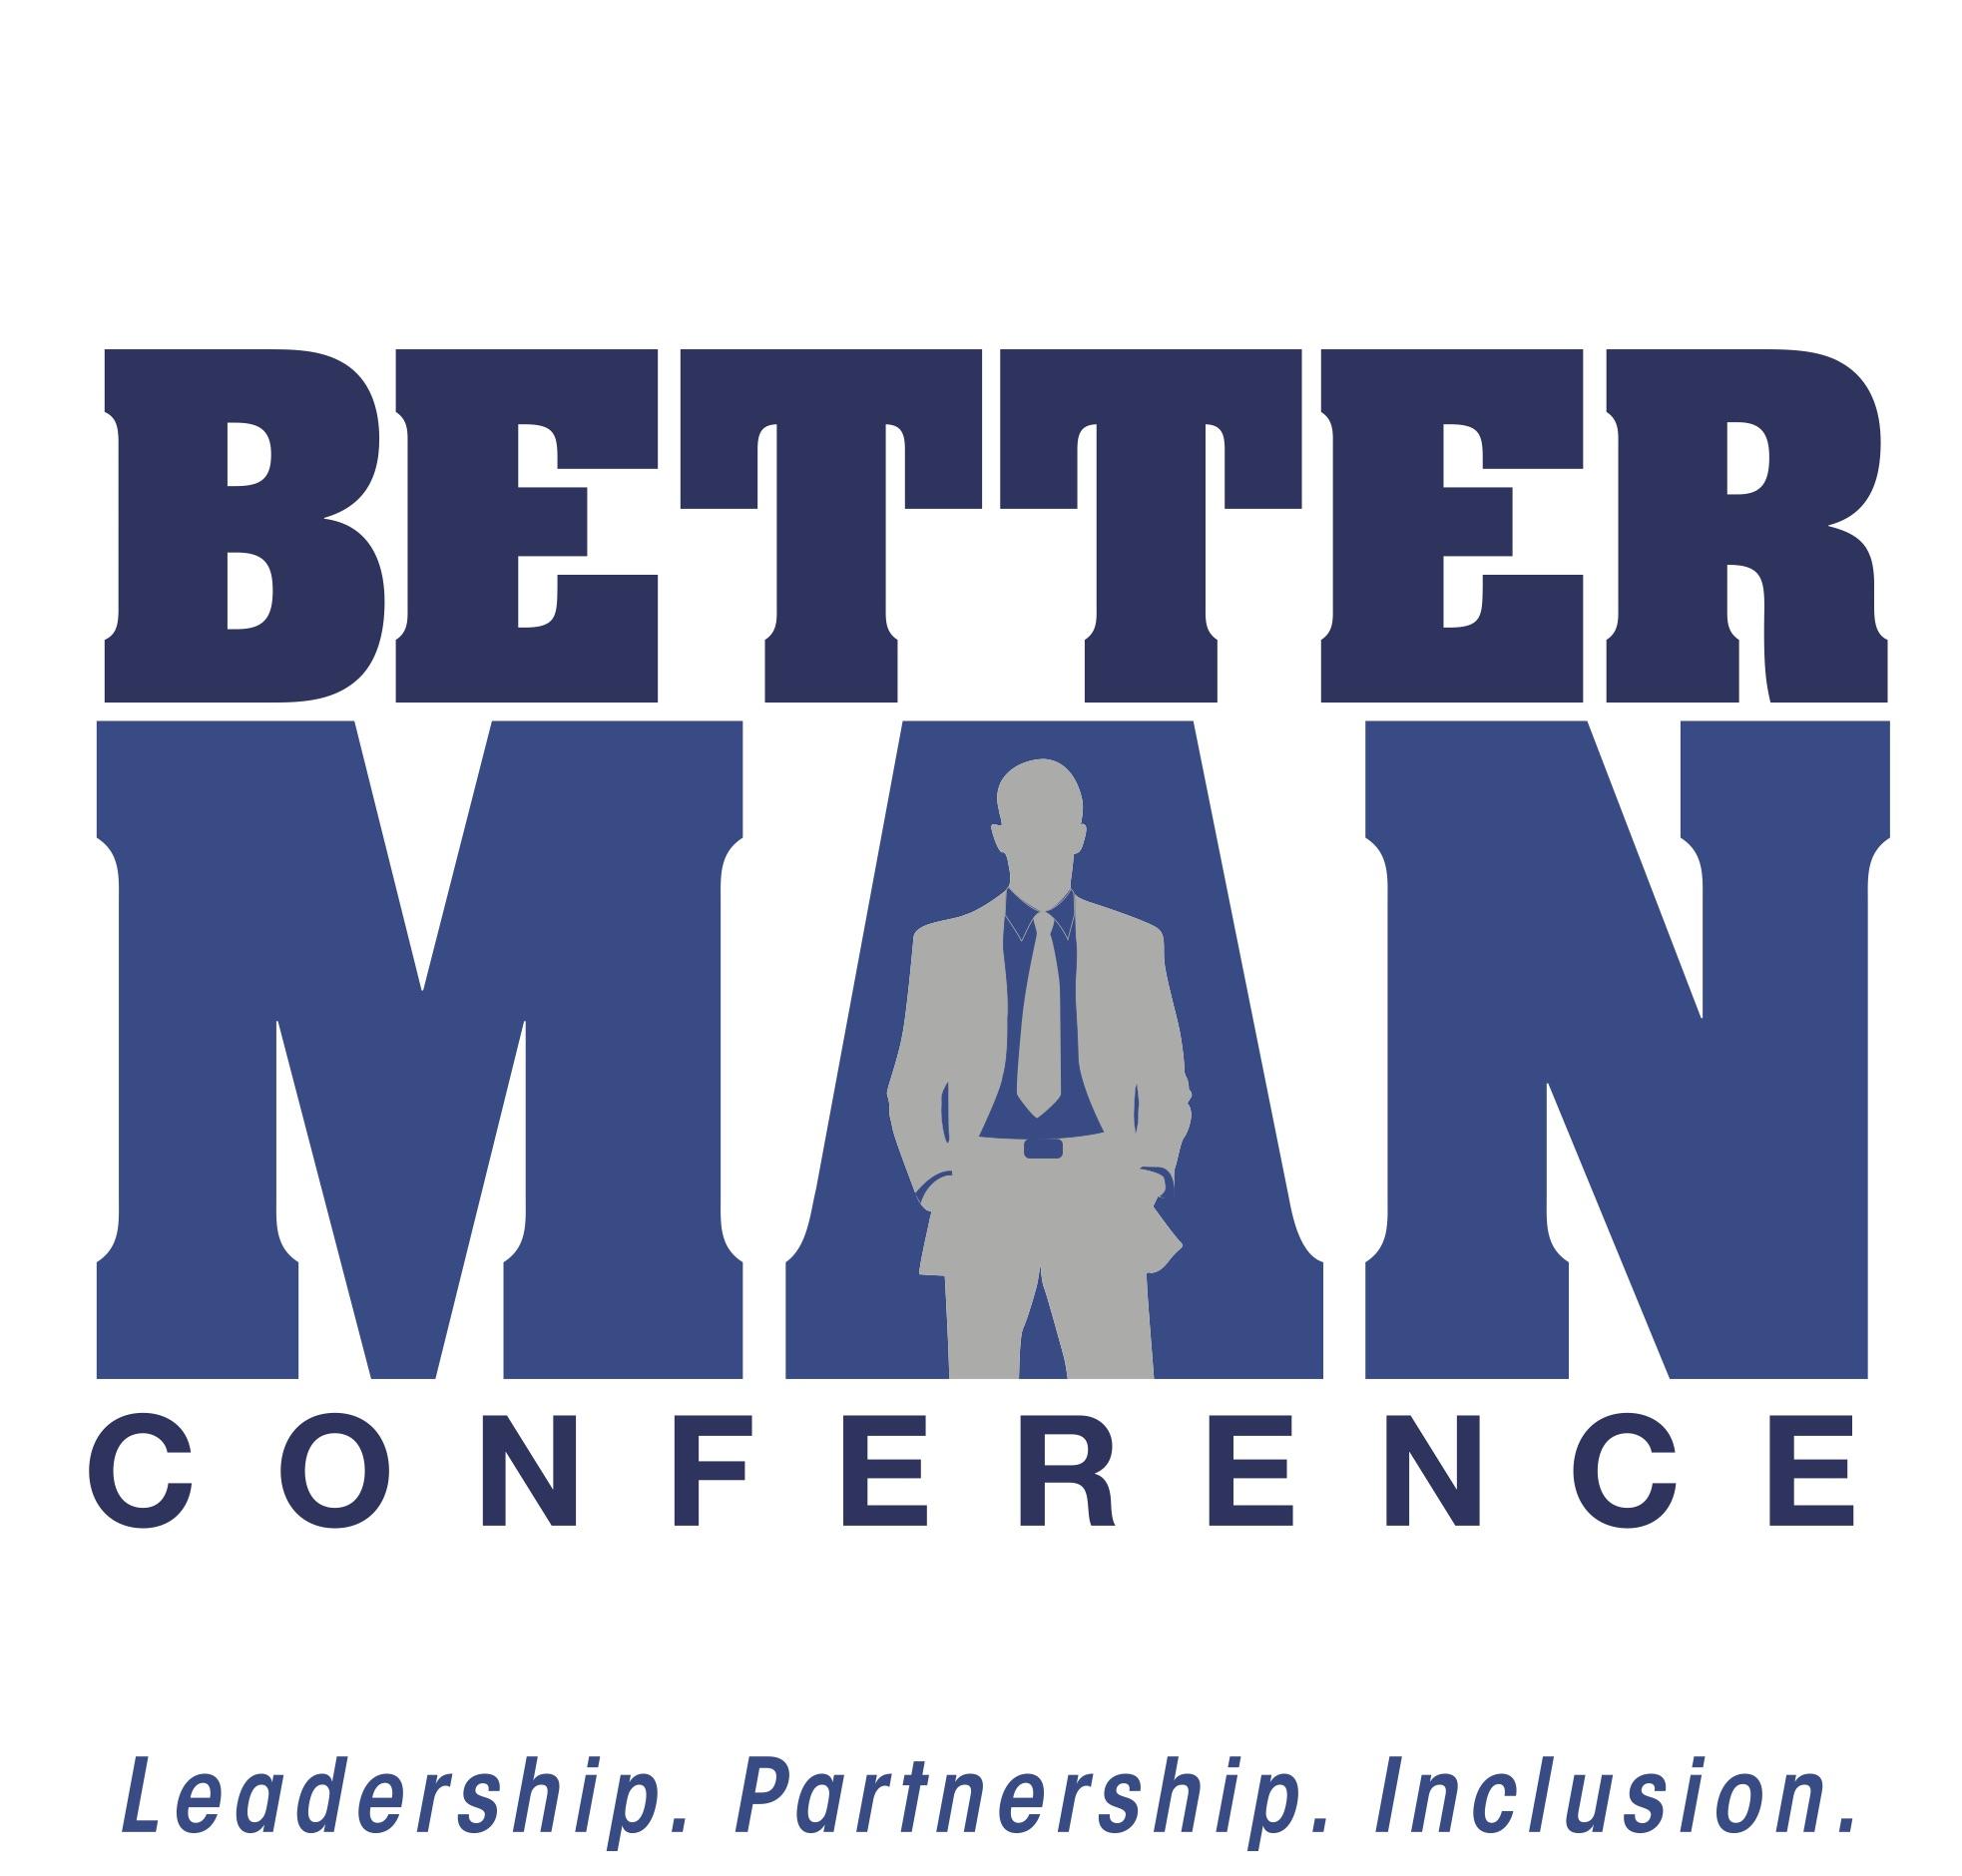 BMC BetterMan_2017_White logo.jpg